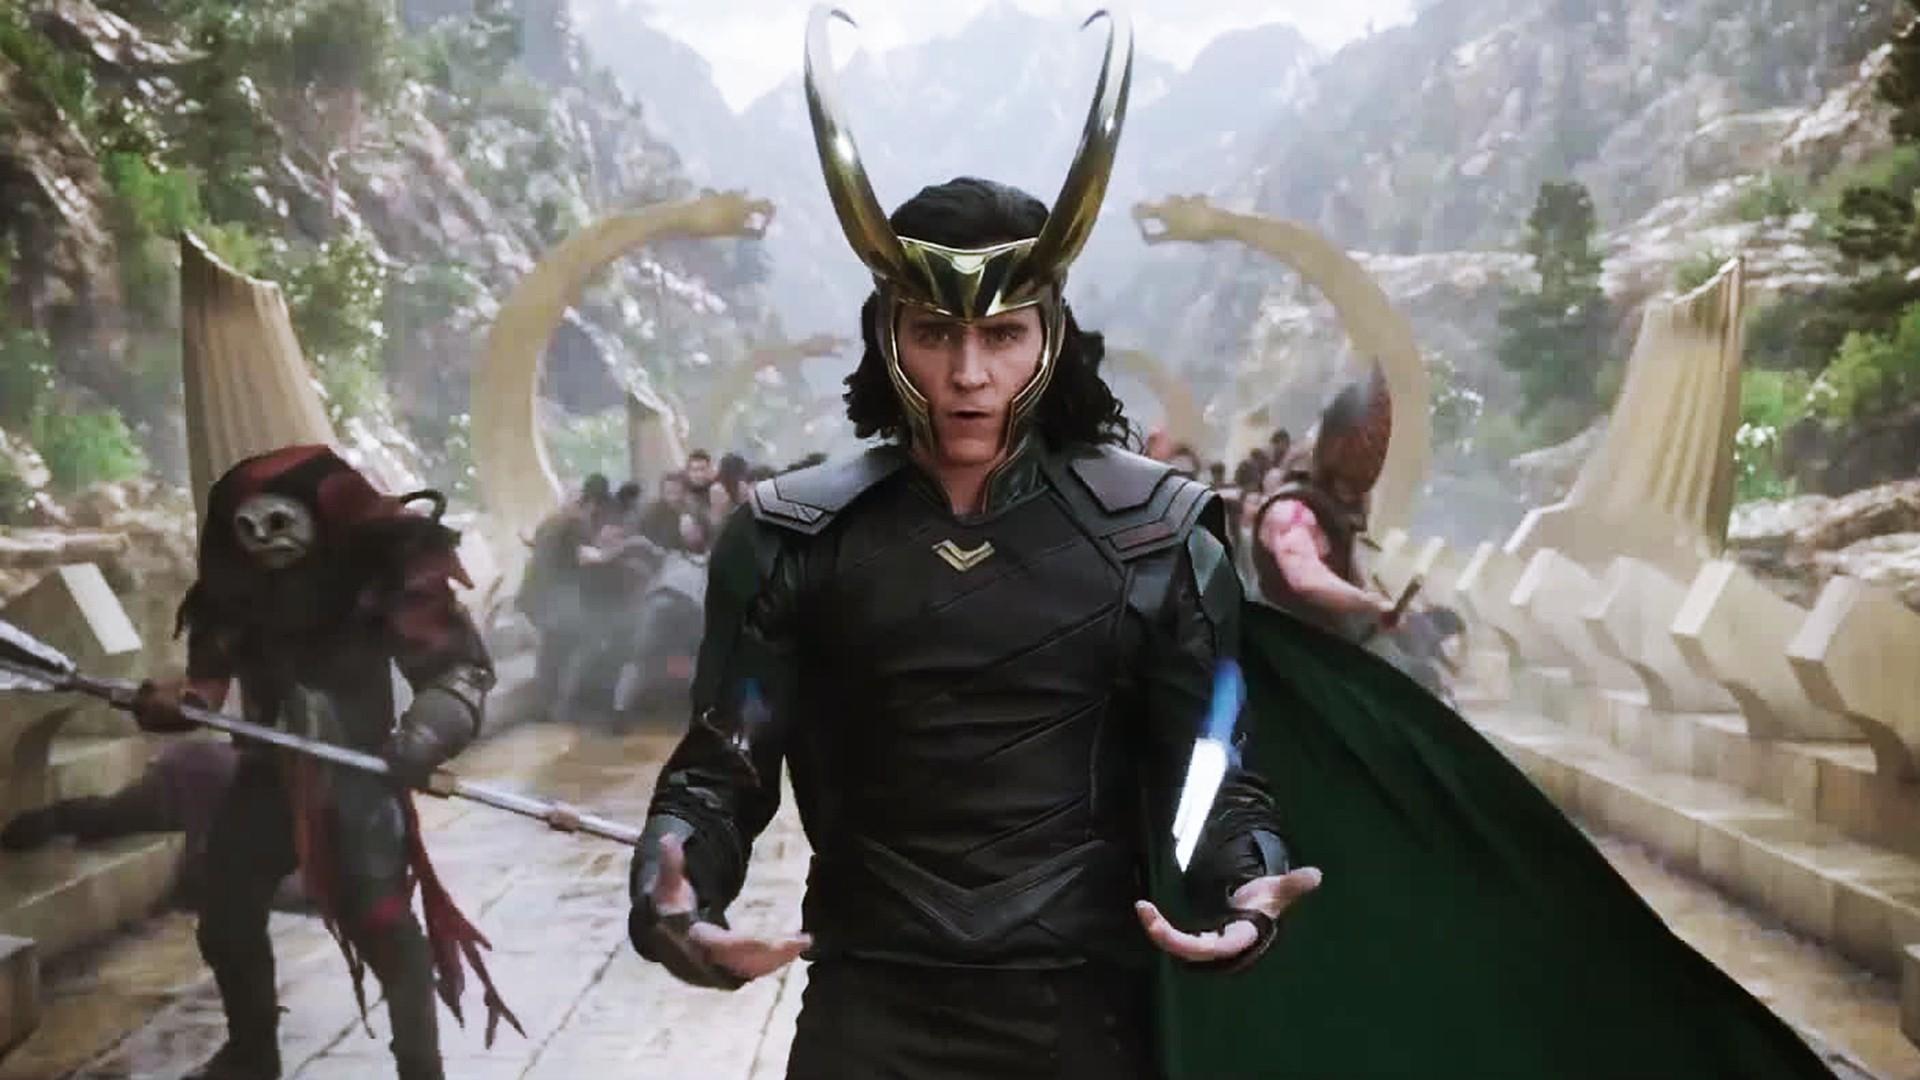 Tom Hiddleston As Loki In Thor Ragnarok Wallpaper - Tom Hiddleston As Loki In Thor Ragnarok - HD Wallpaper